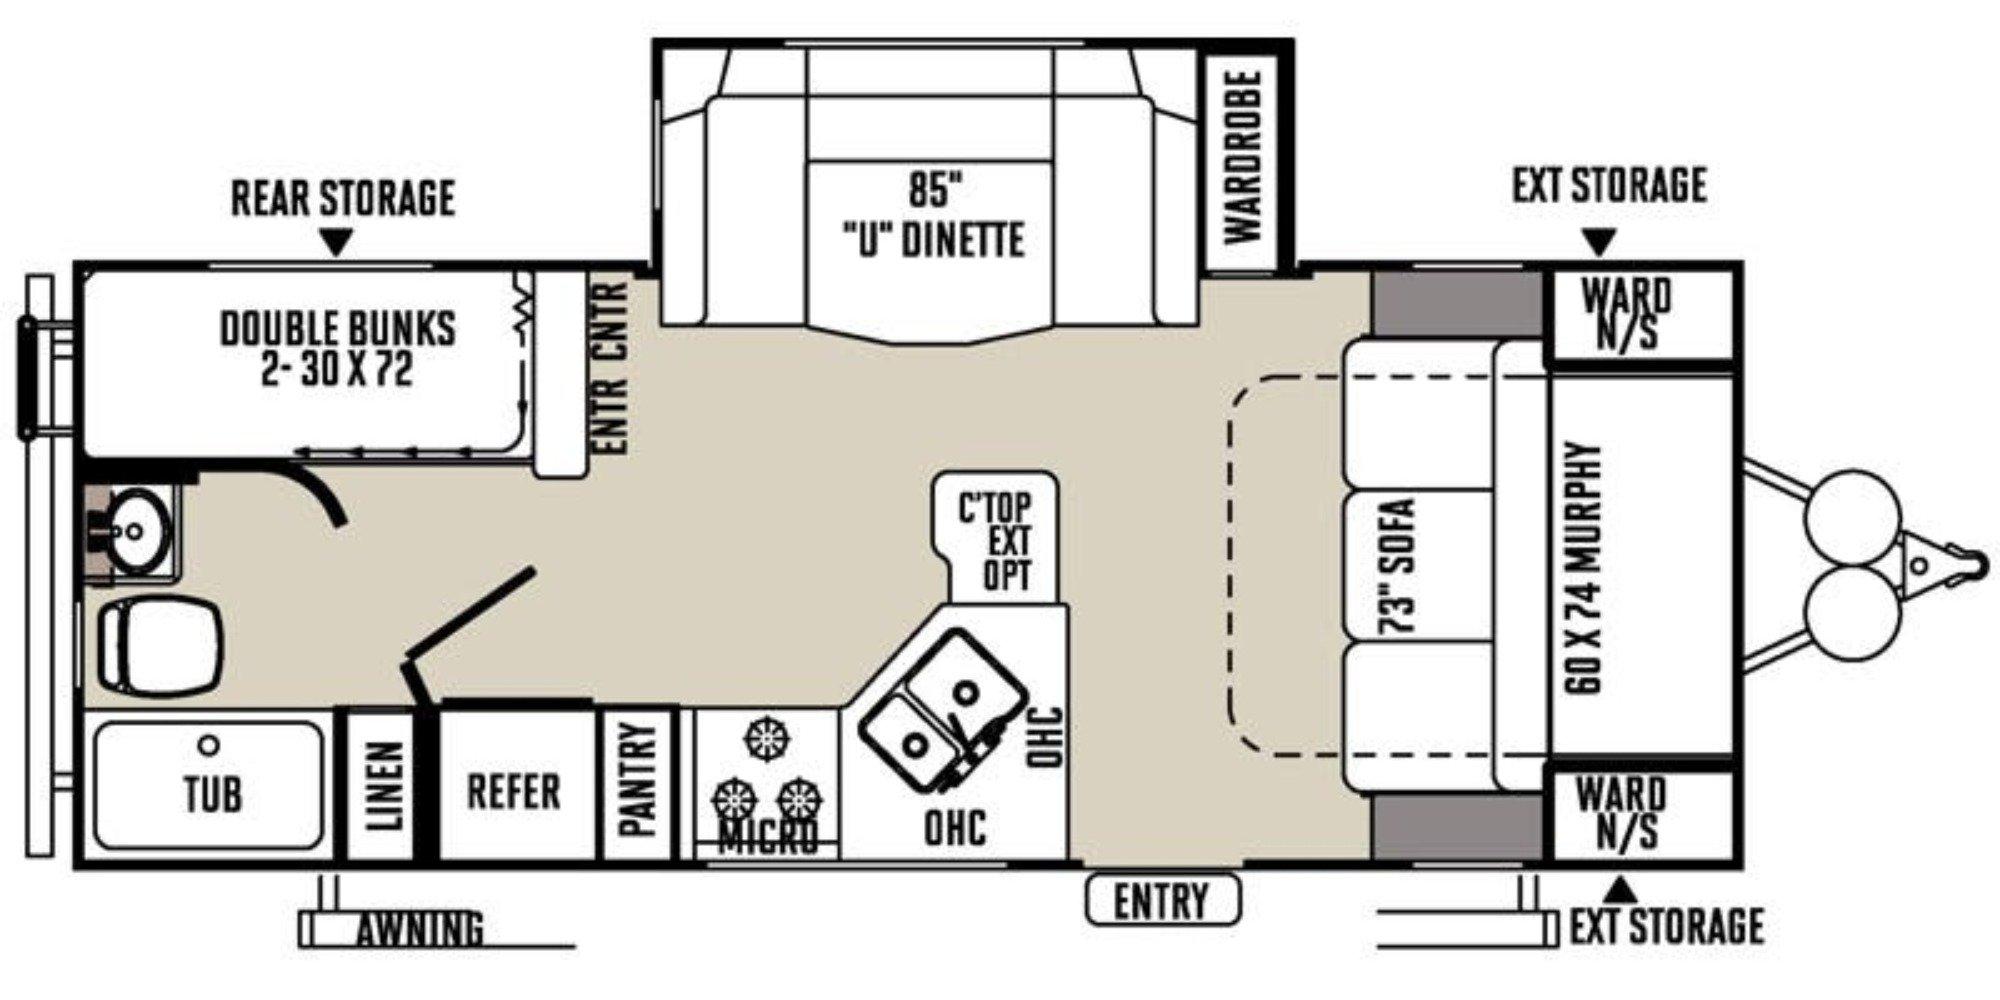 View Floor Plan for 2016 FOREST RIVER ROCKWOOD MINI LITE 2504S